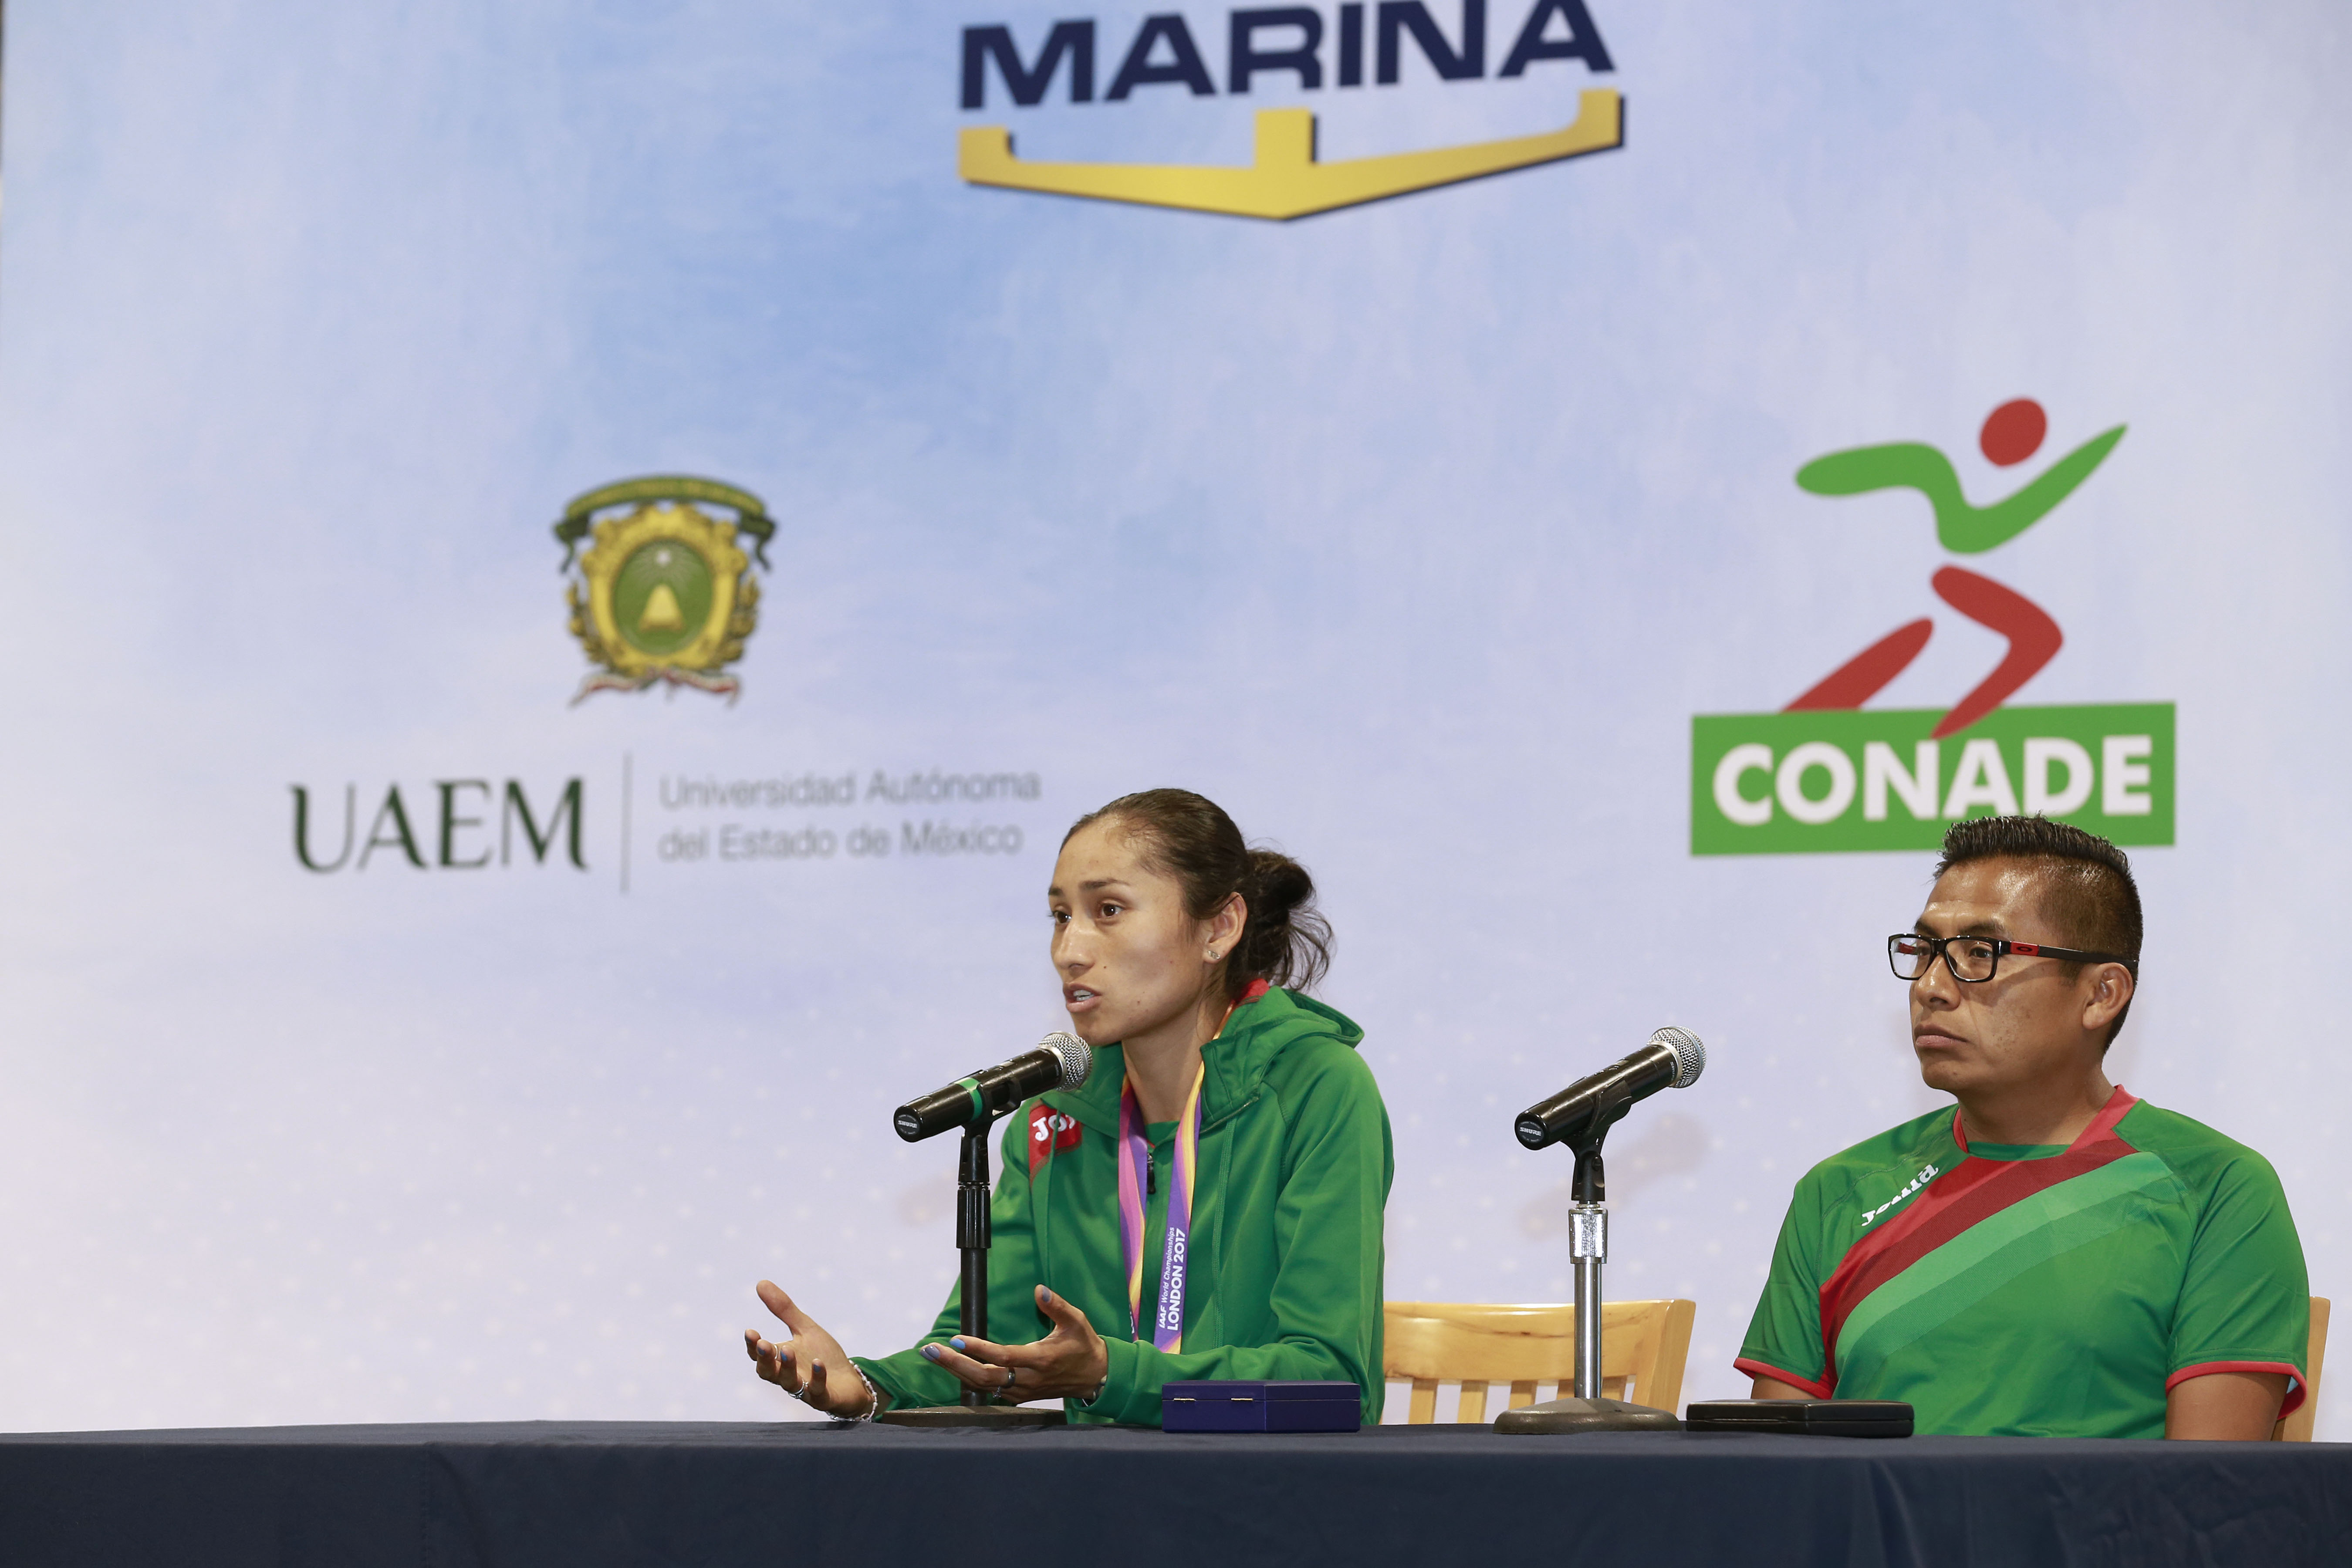 Apoyo de UAEM, fundamental para consolidar mi carrera: Lupita González